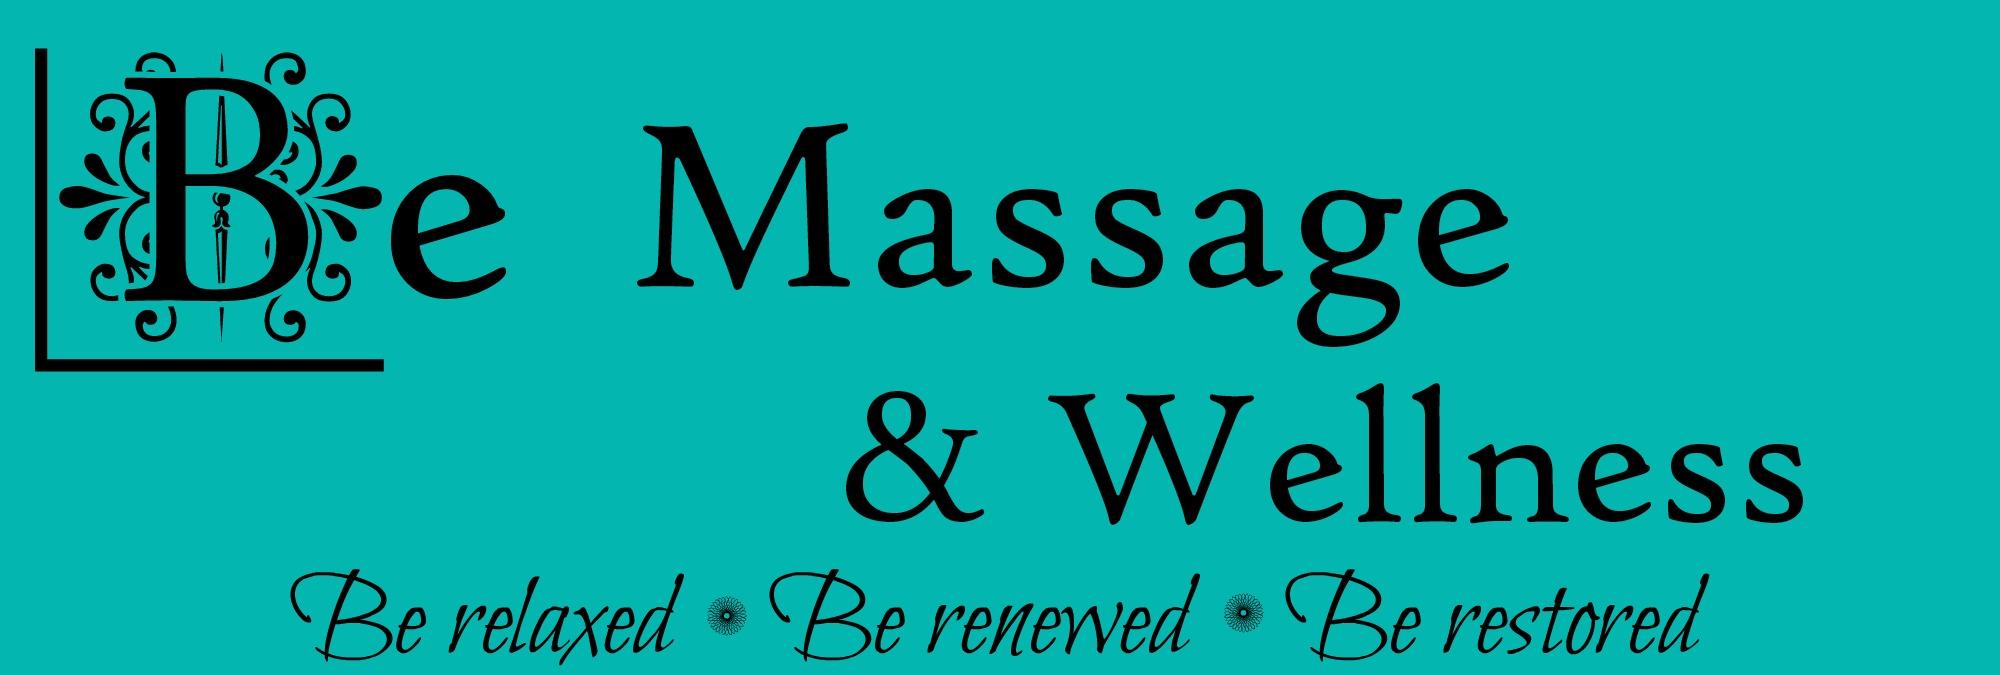 Be Massage & Wellness